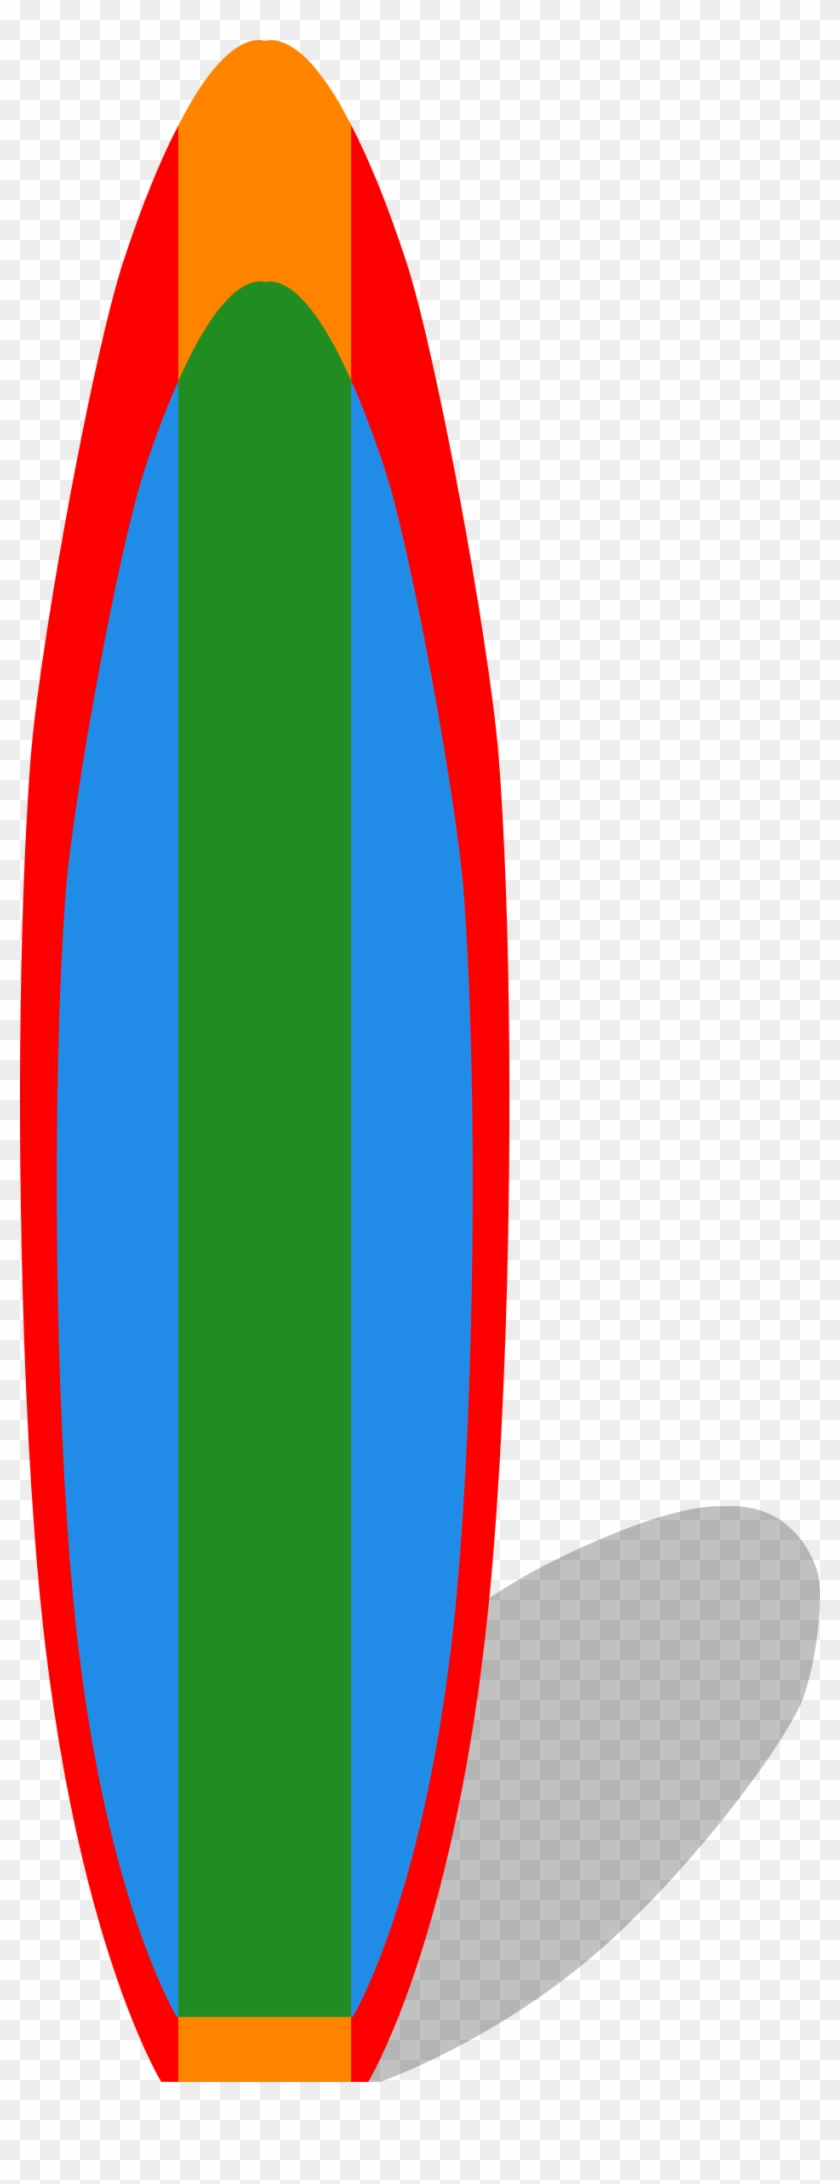 Surfboard Allison Surf Board Clipart - Surfboard Clipart #18039